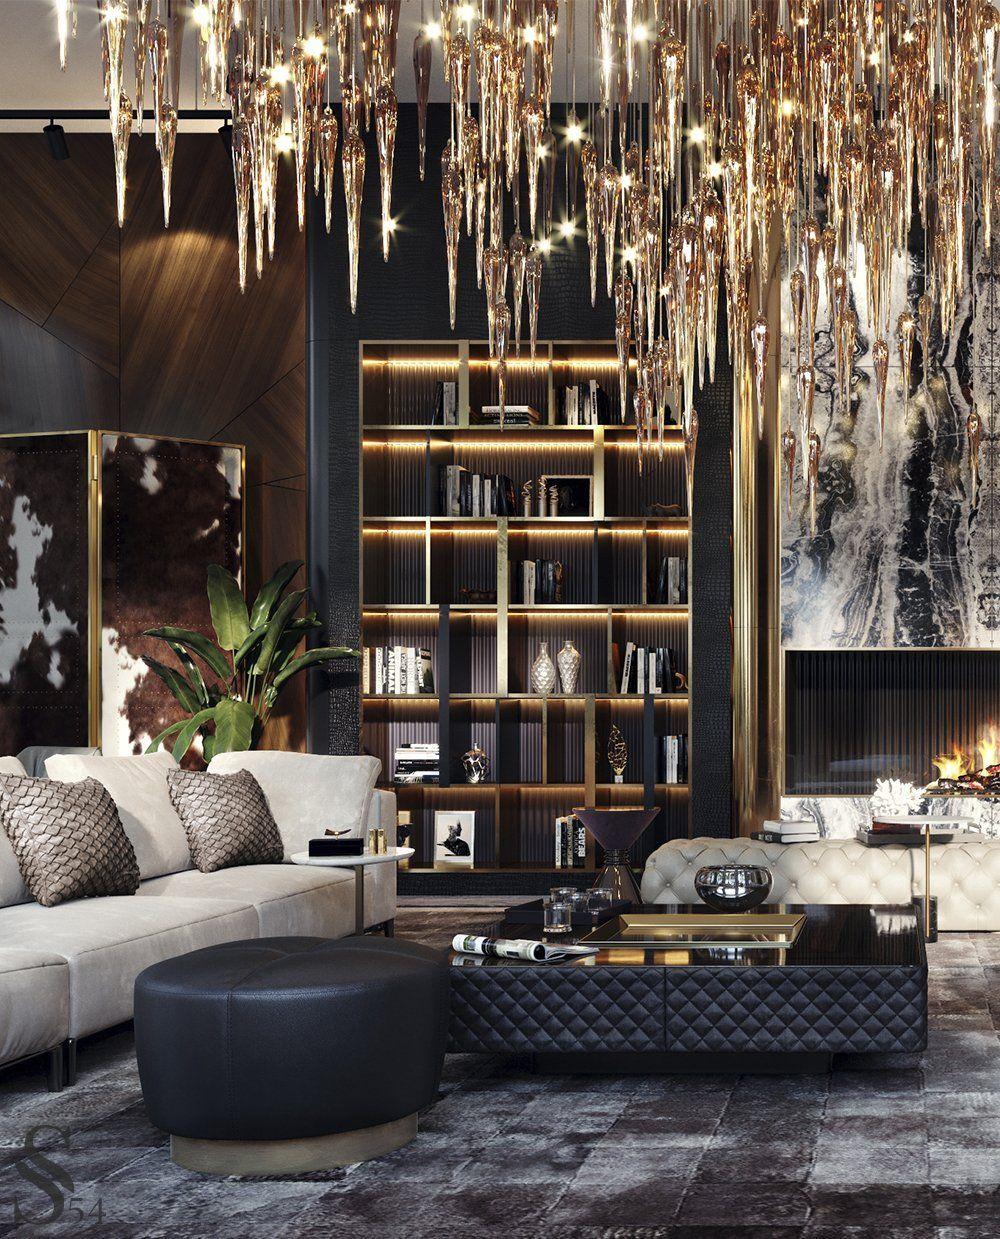 Riyadh Exclusive Lifestyle Luxury Living Room Ideas In 2021 Luxury Living Room Room Interior Luxury Home Decor Living room ideas luxury